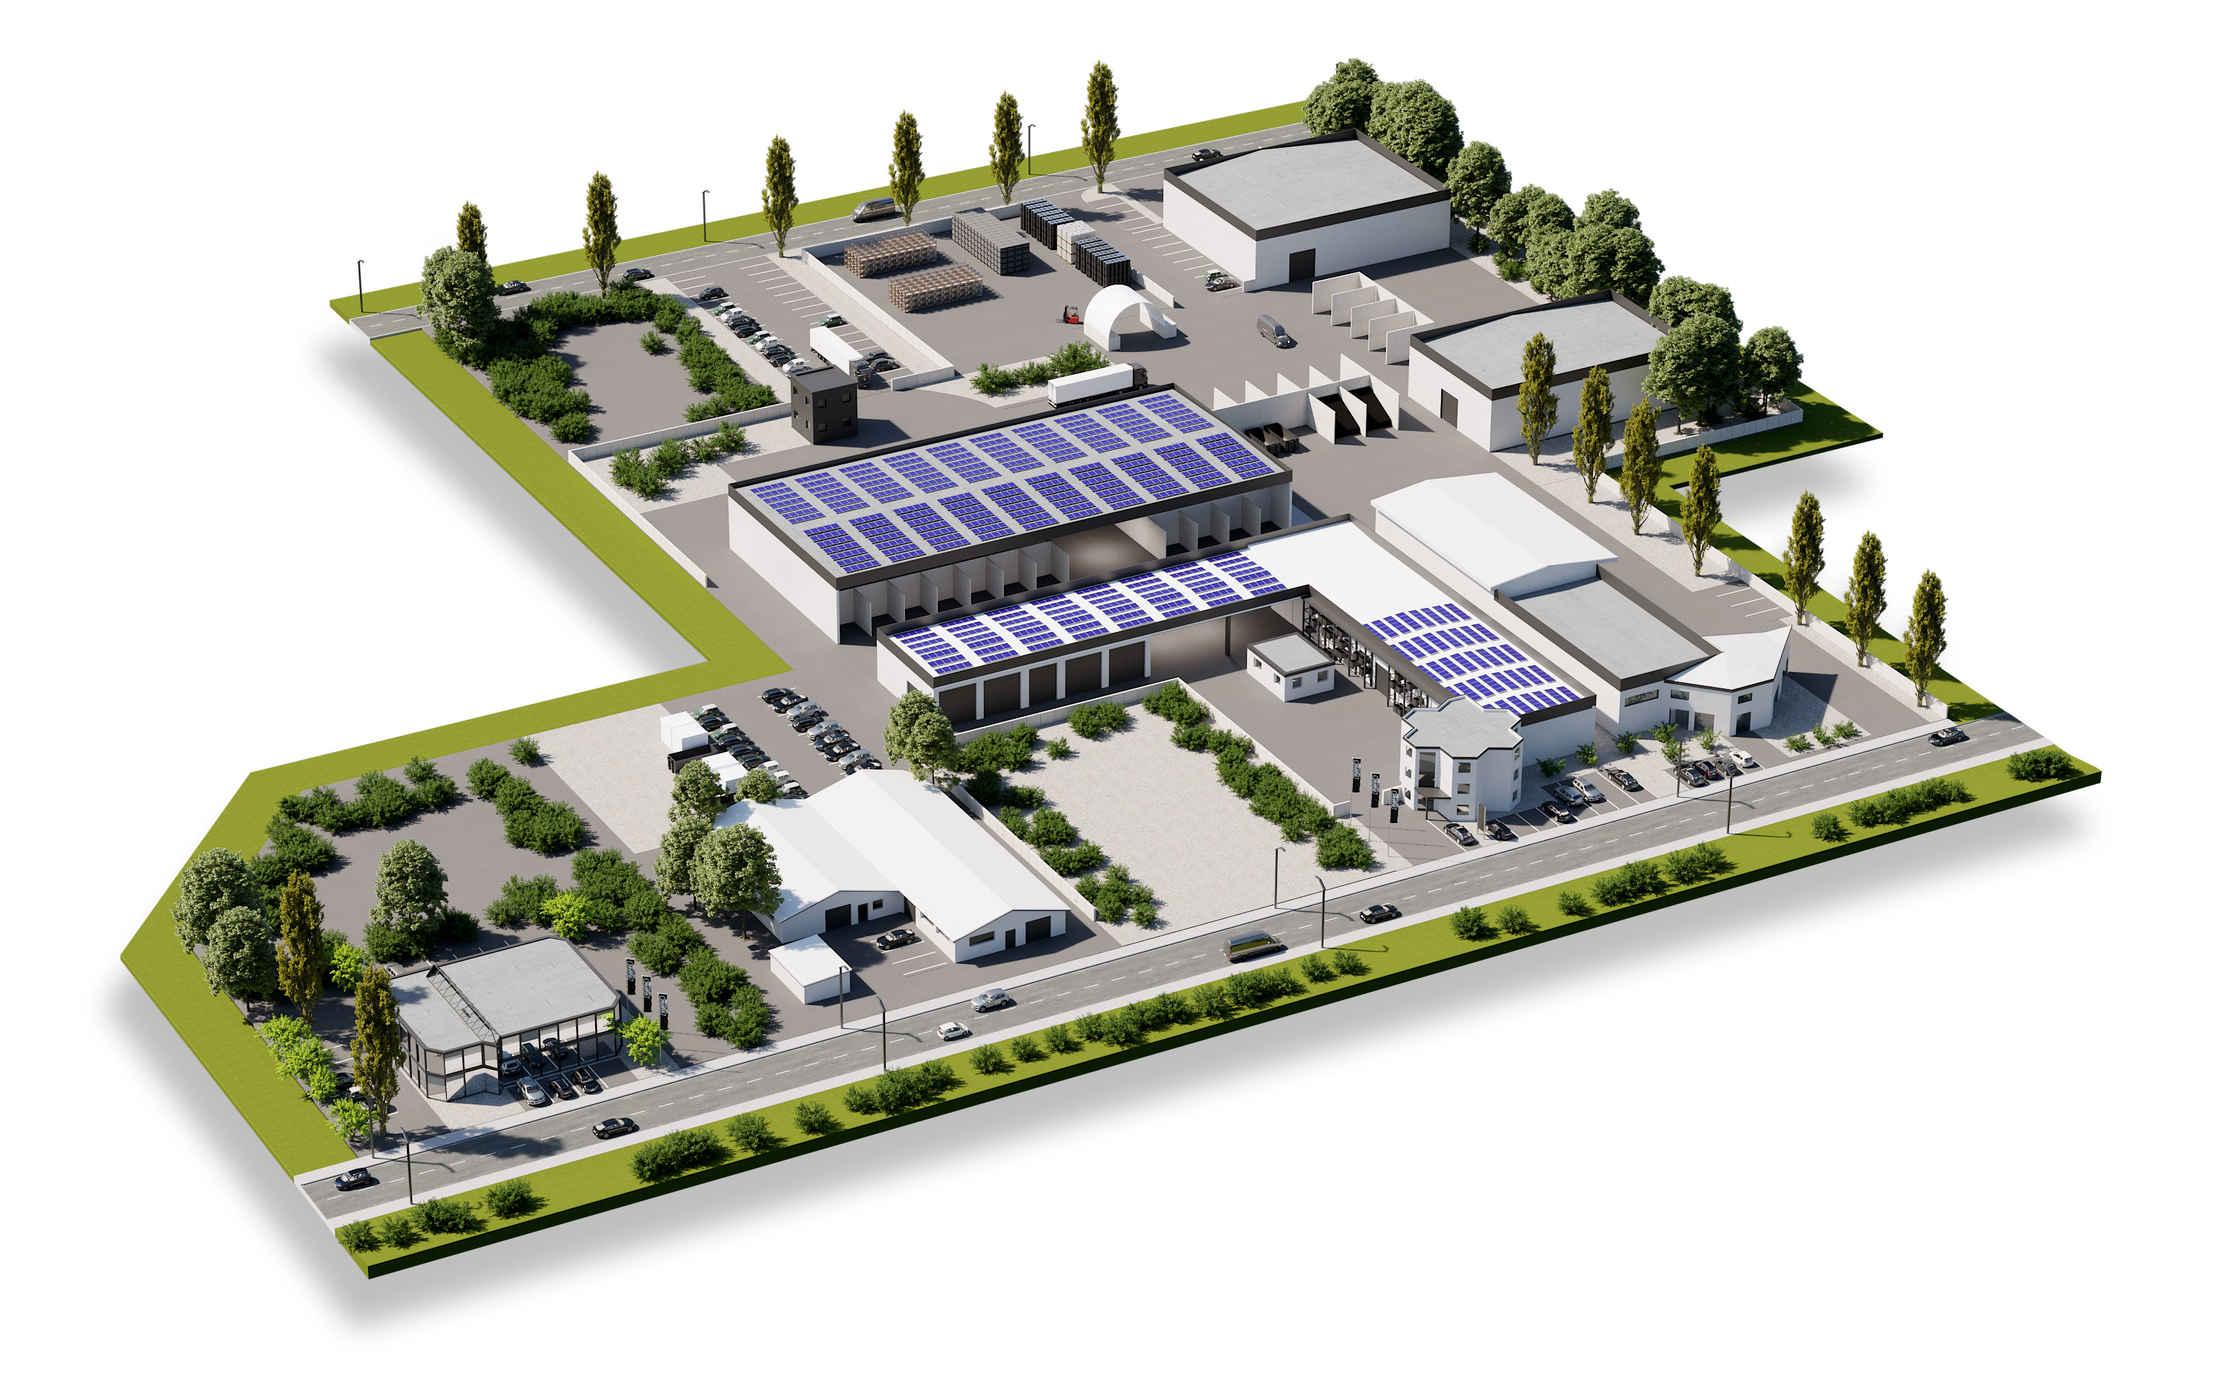 mairec edelmetall precious metals recycling werk firmengelaende standort alzenau company germany